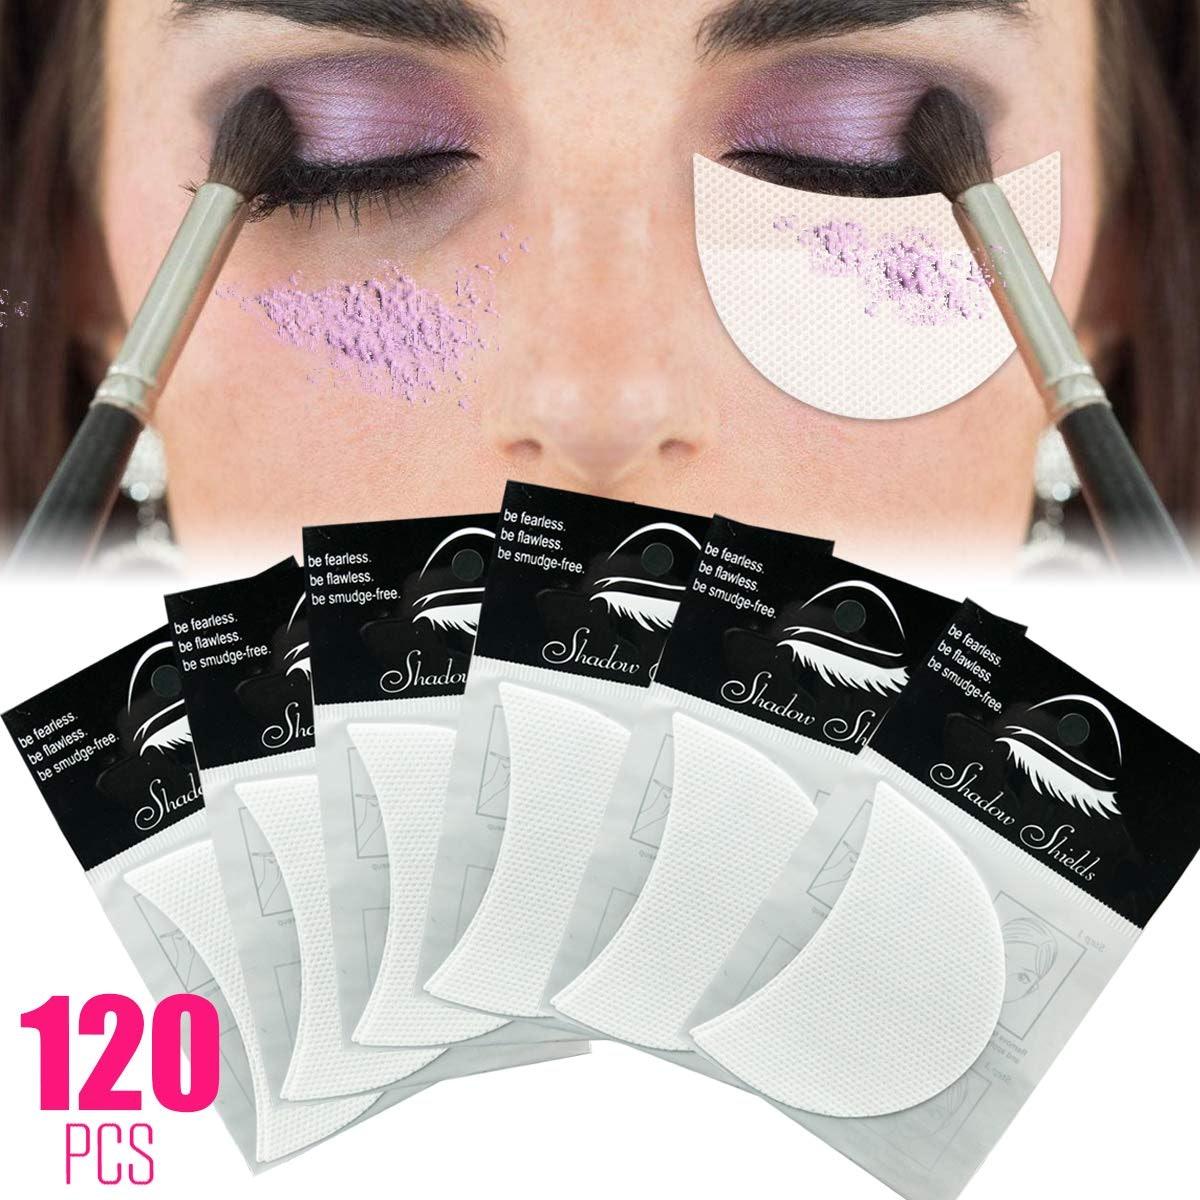 TailaiMei Eye Make Up Shields (120-Pieces)